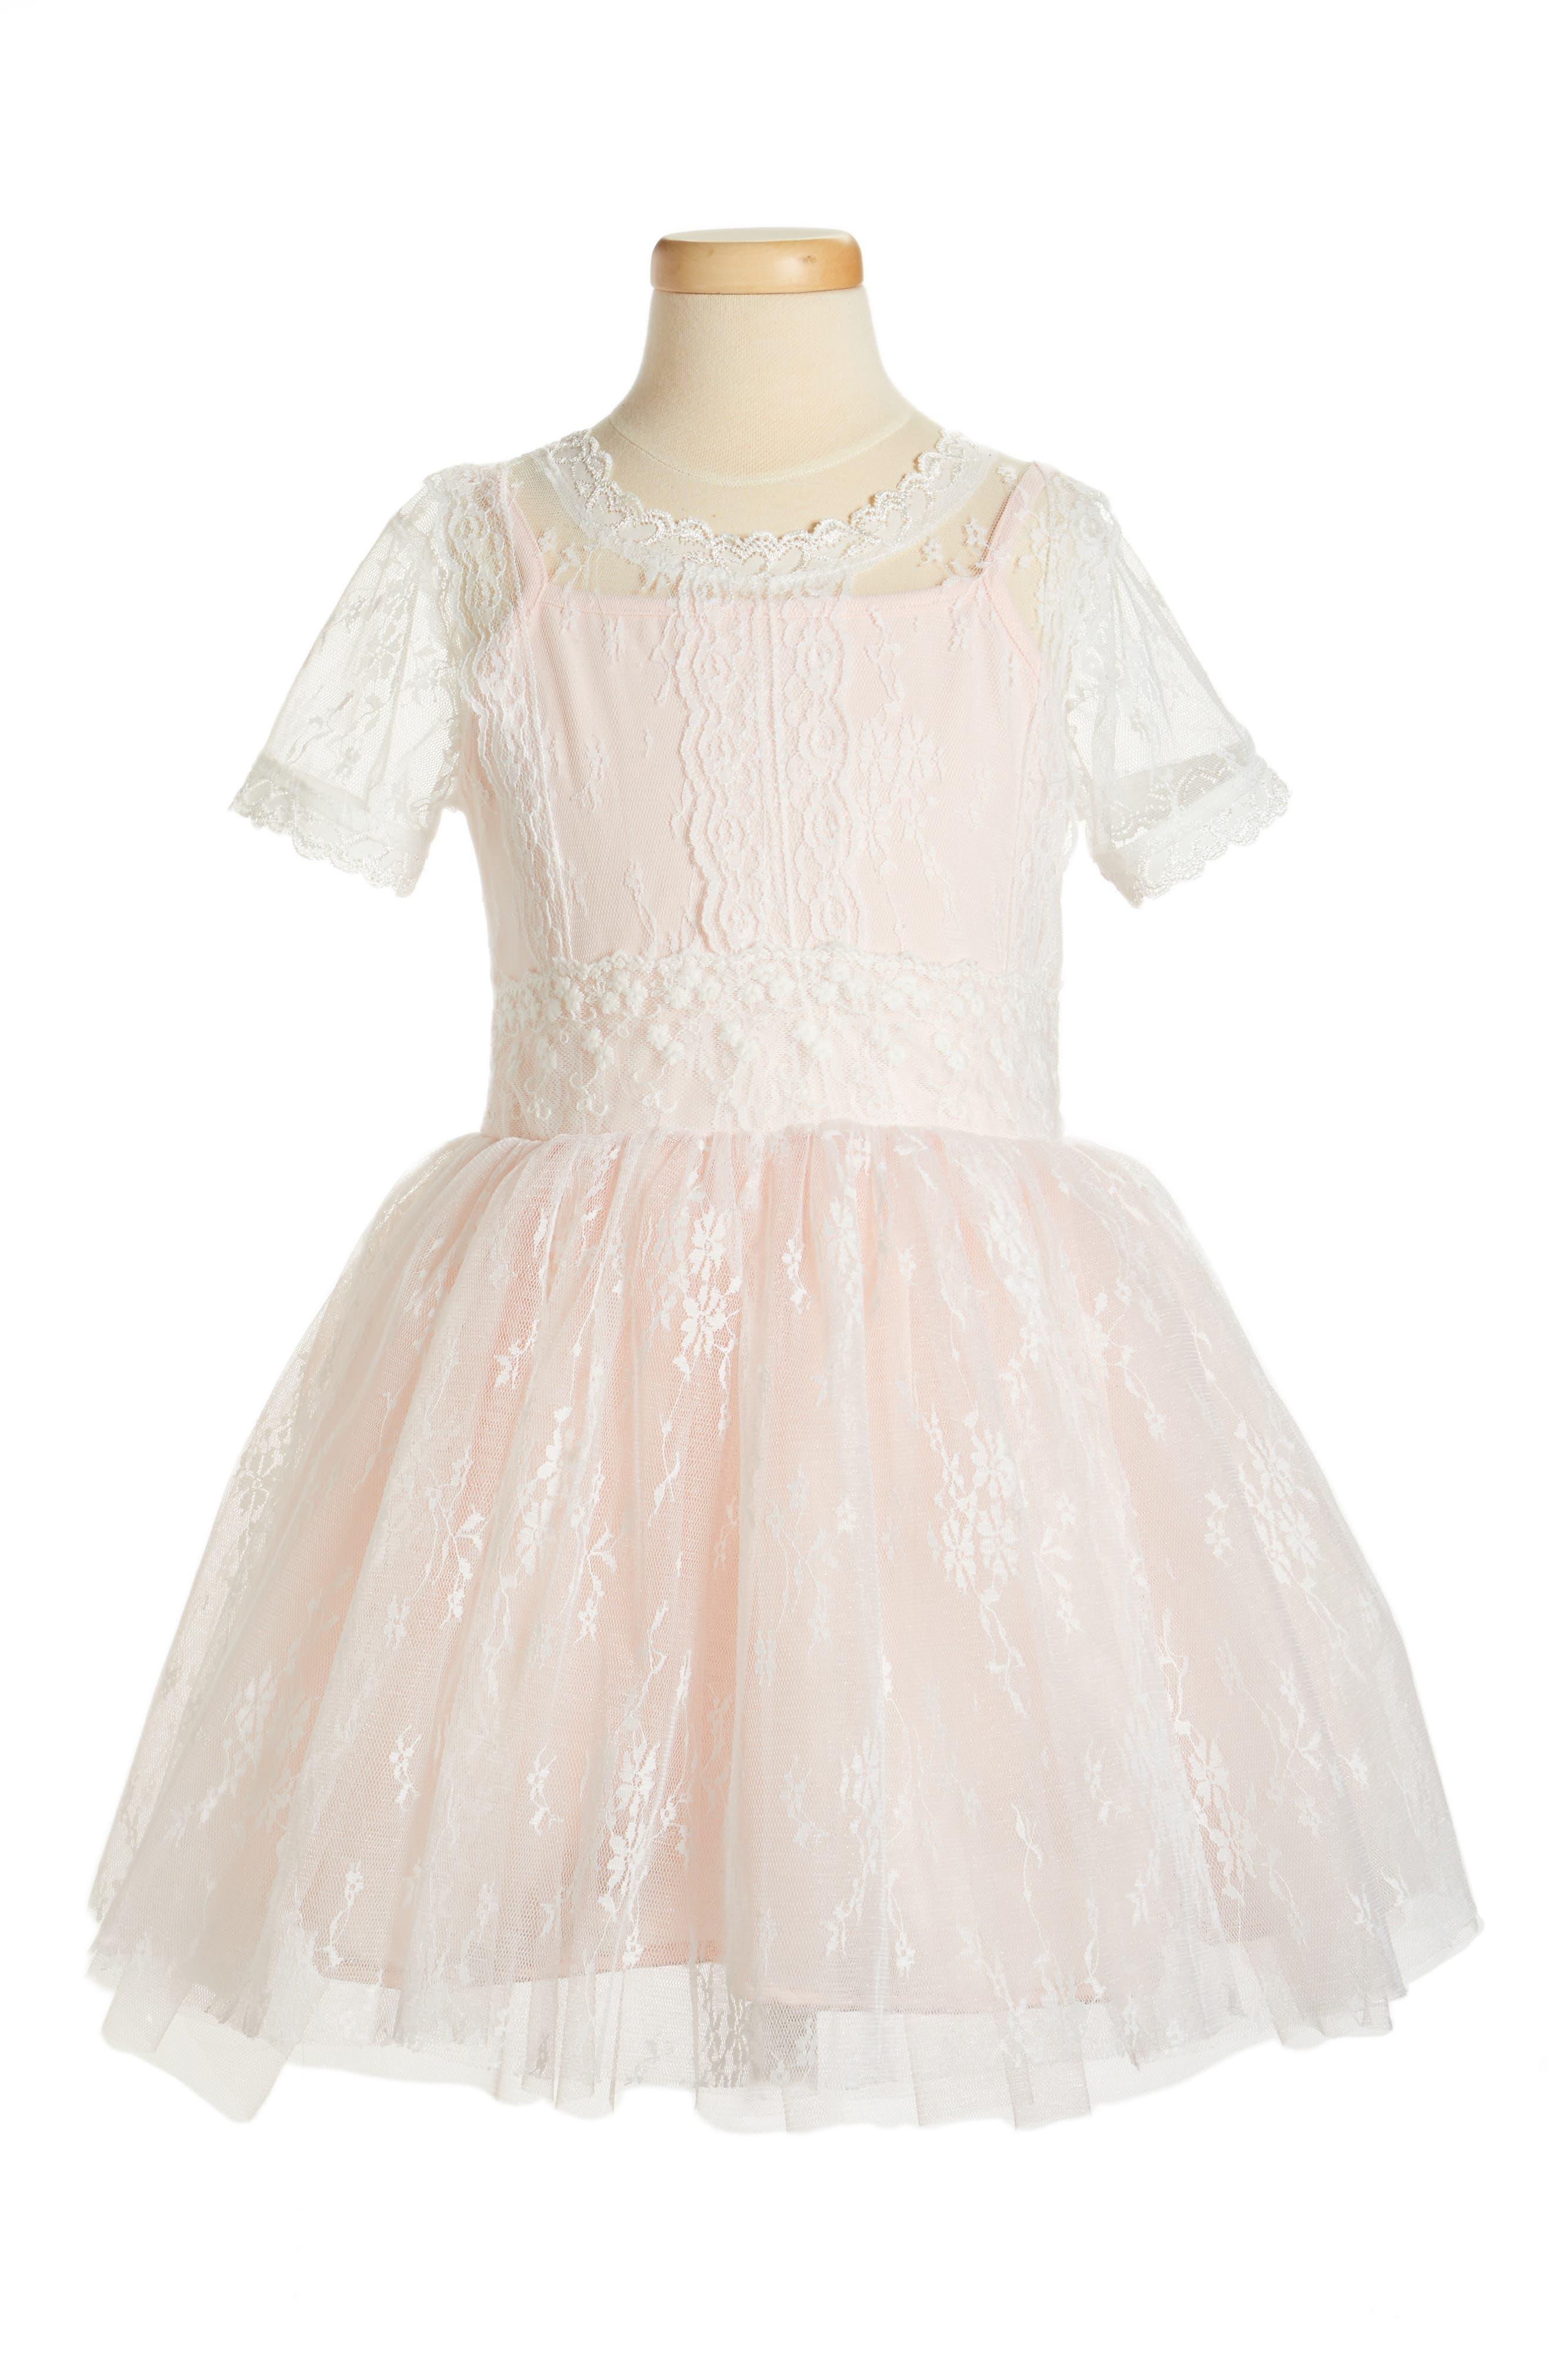 Main Image - Popatu Lace Dress (Toddler Girls, Little Girls & Big Girls)